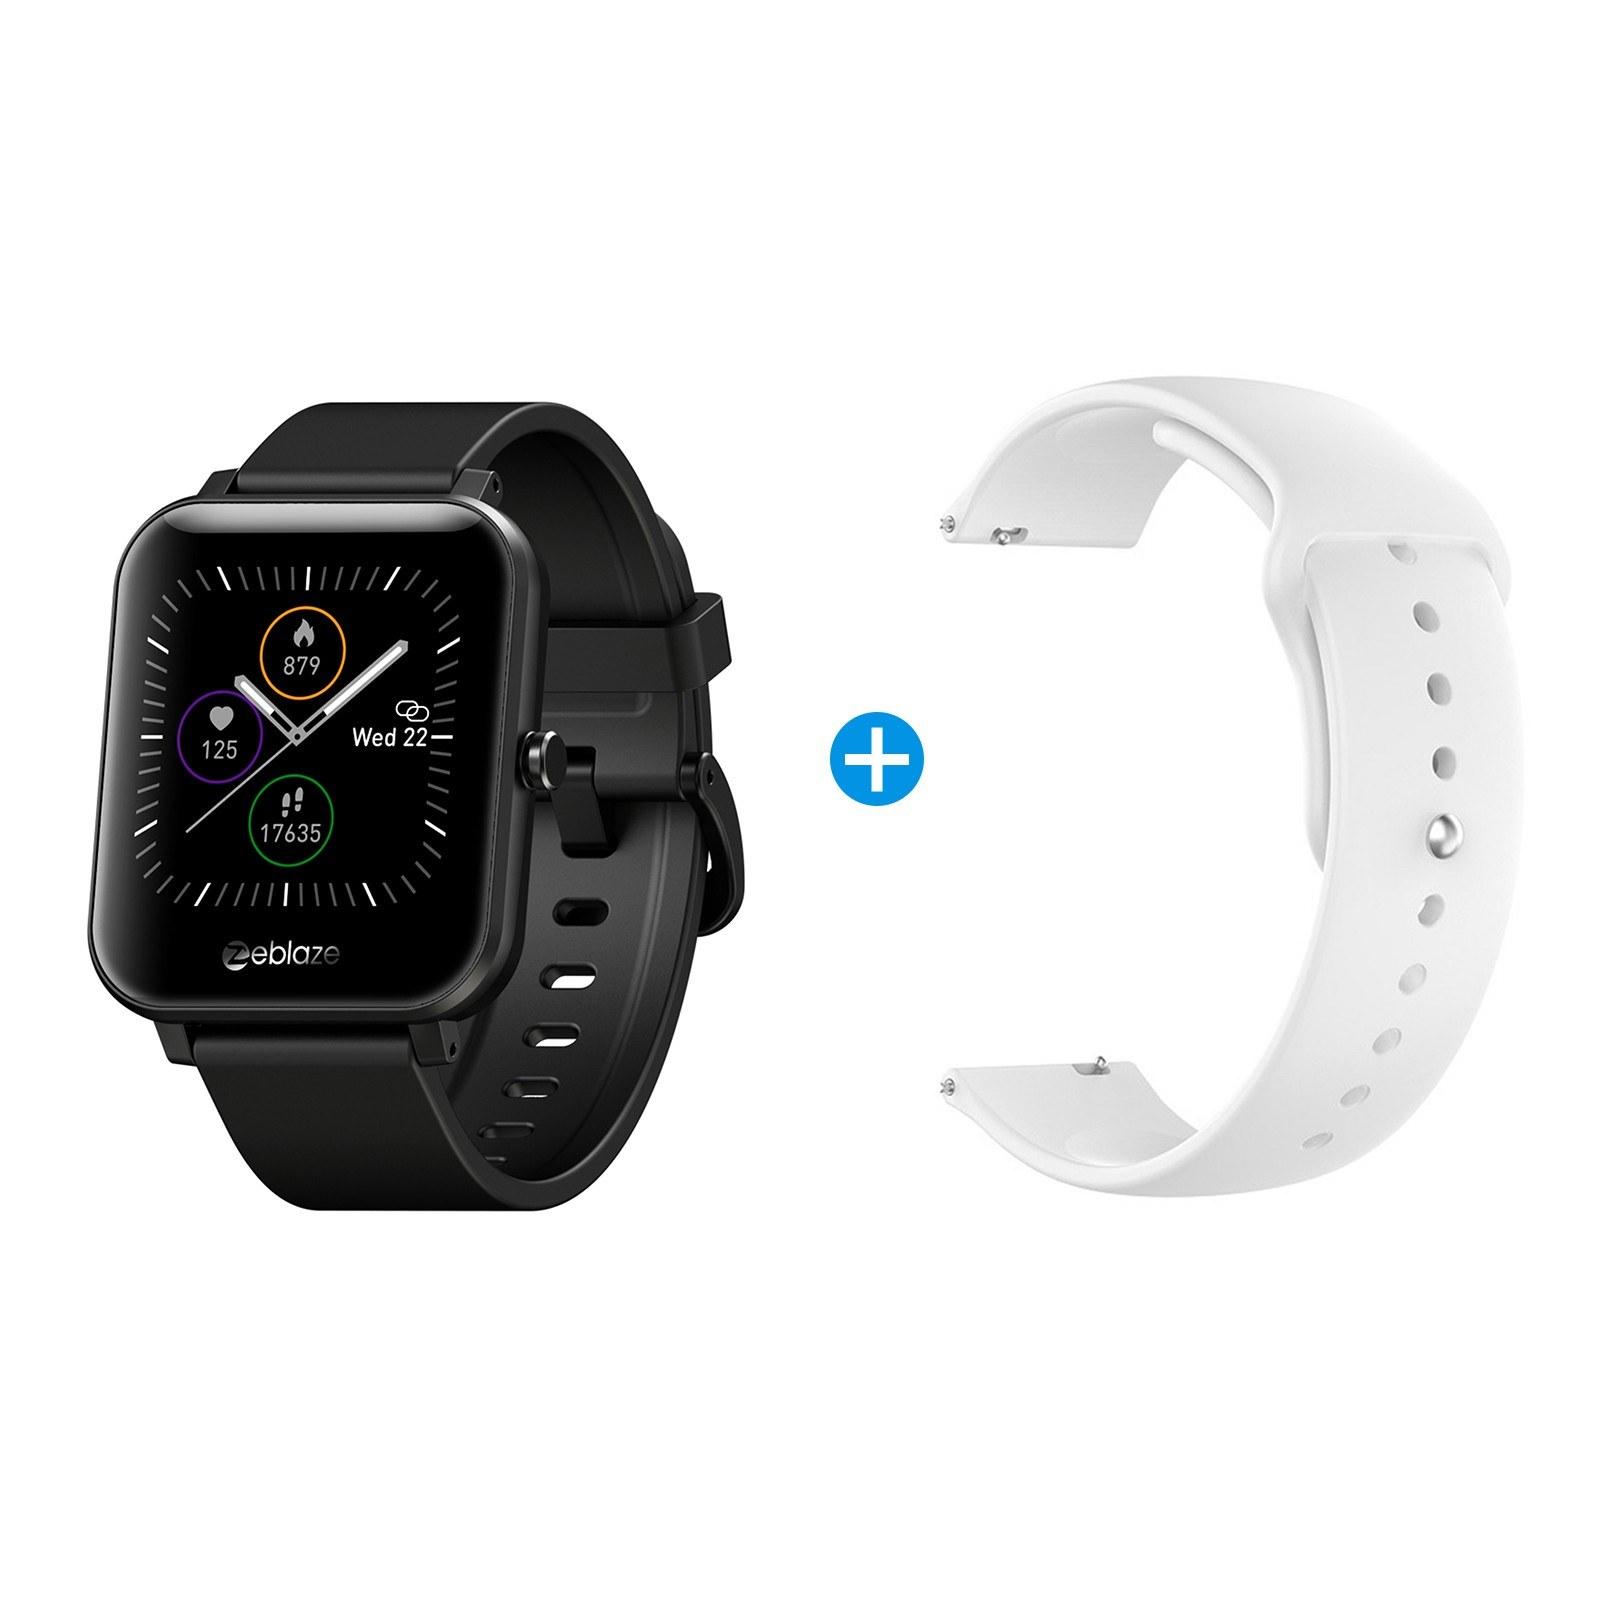 Cafago - 54% OFF Zeblaze GTS Smart Watch,free shipping+$29.47